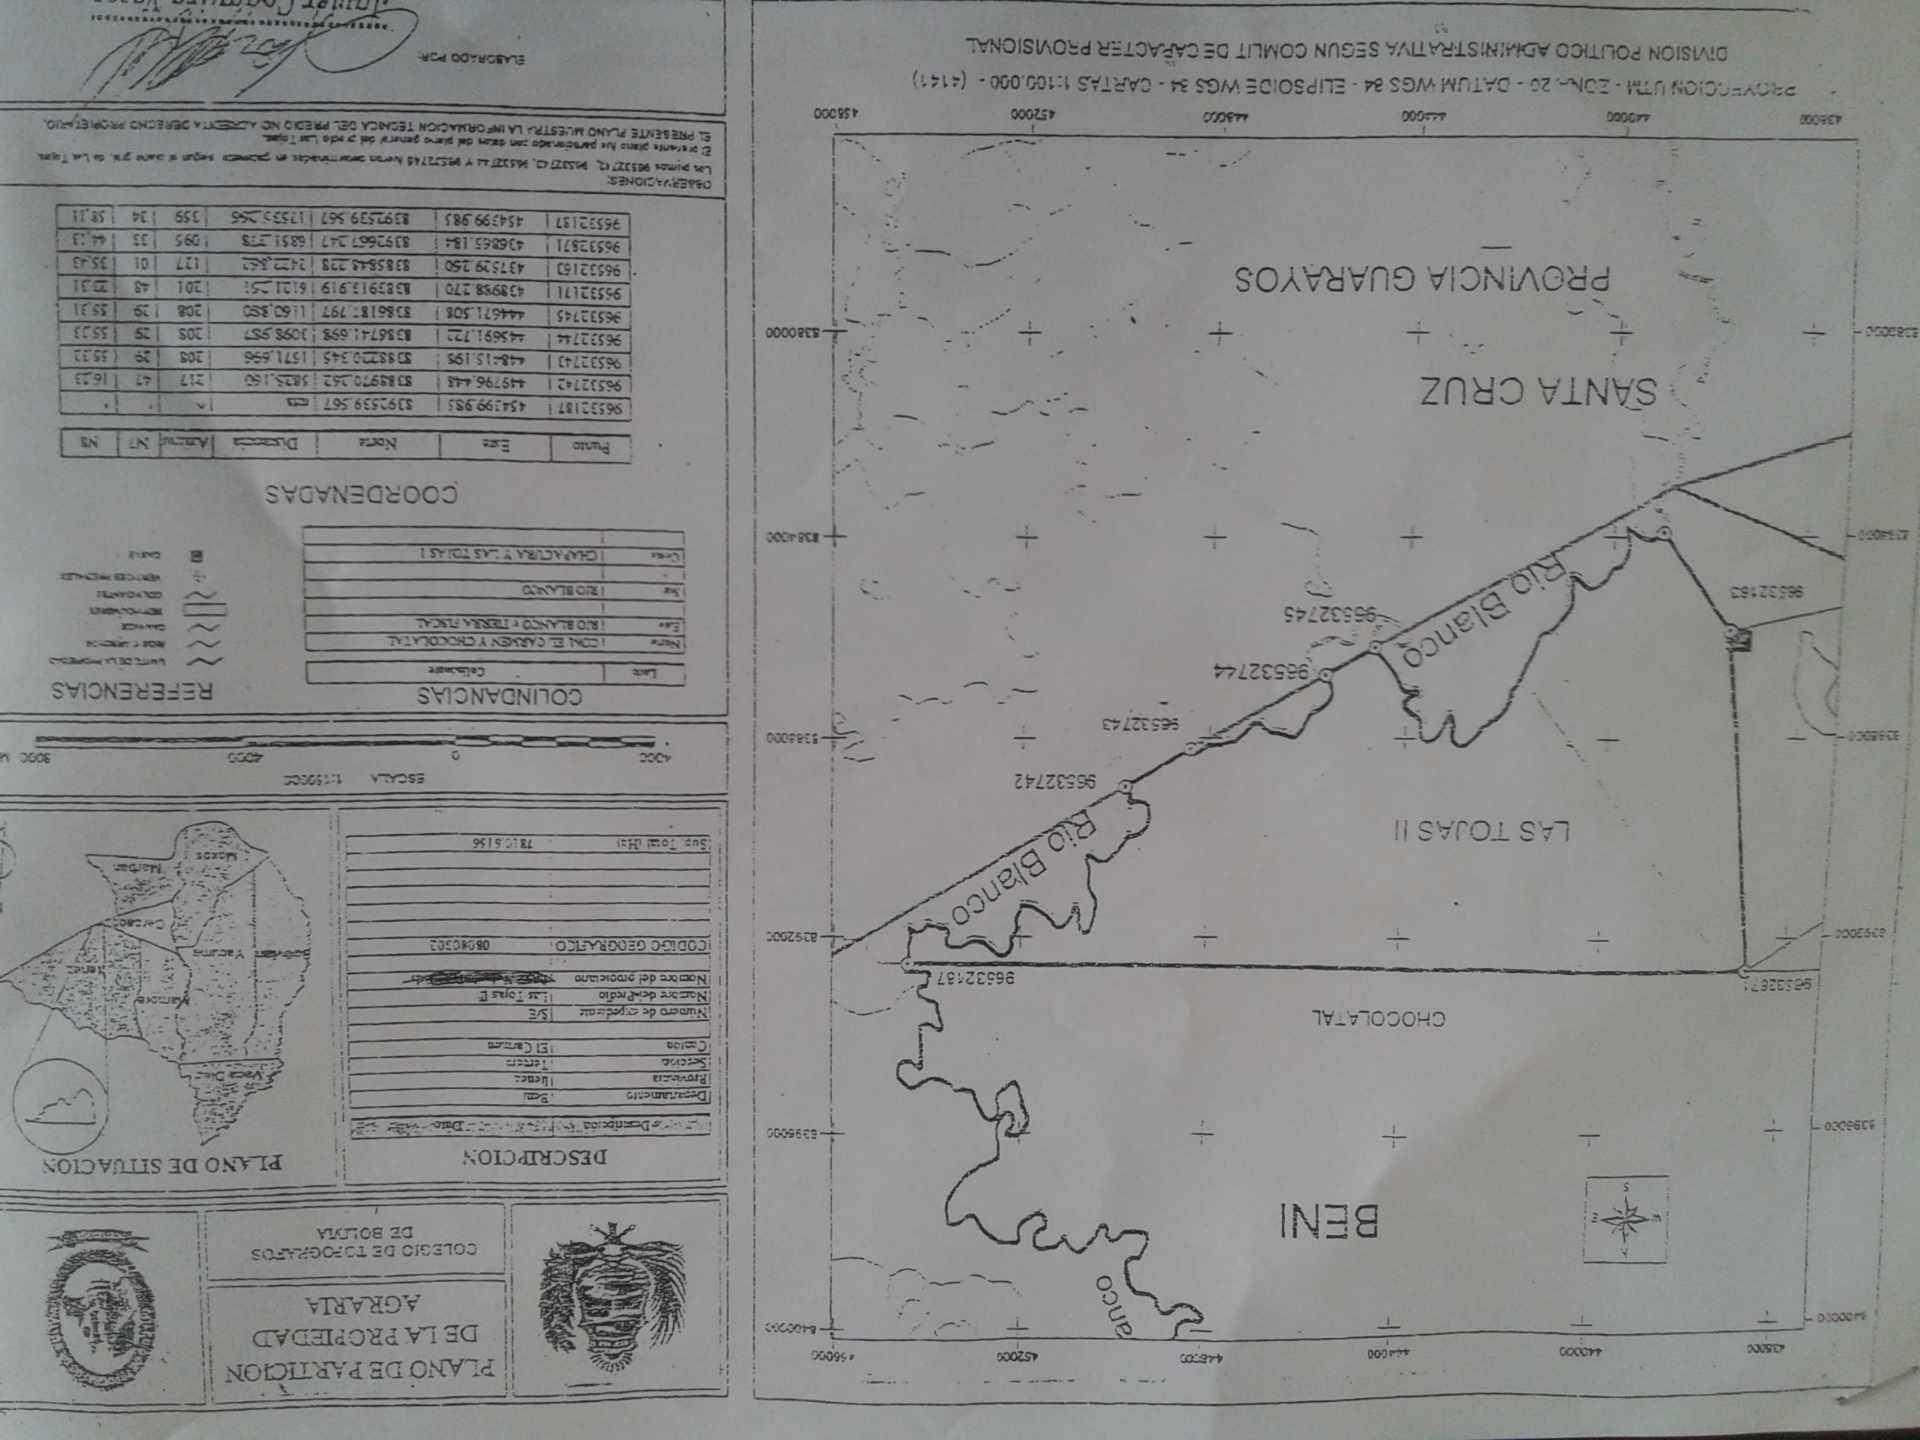 Terreno en Venta DE  SAN PABLO DEL BENI,  HACIA CARMEN DEL ITENEZ, 40 KILOMETROS,  CARRETERA RIPIADA Foto 1